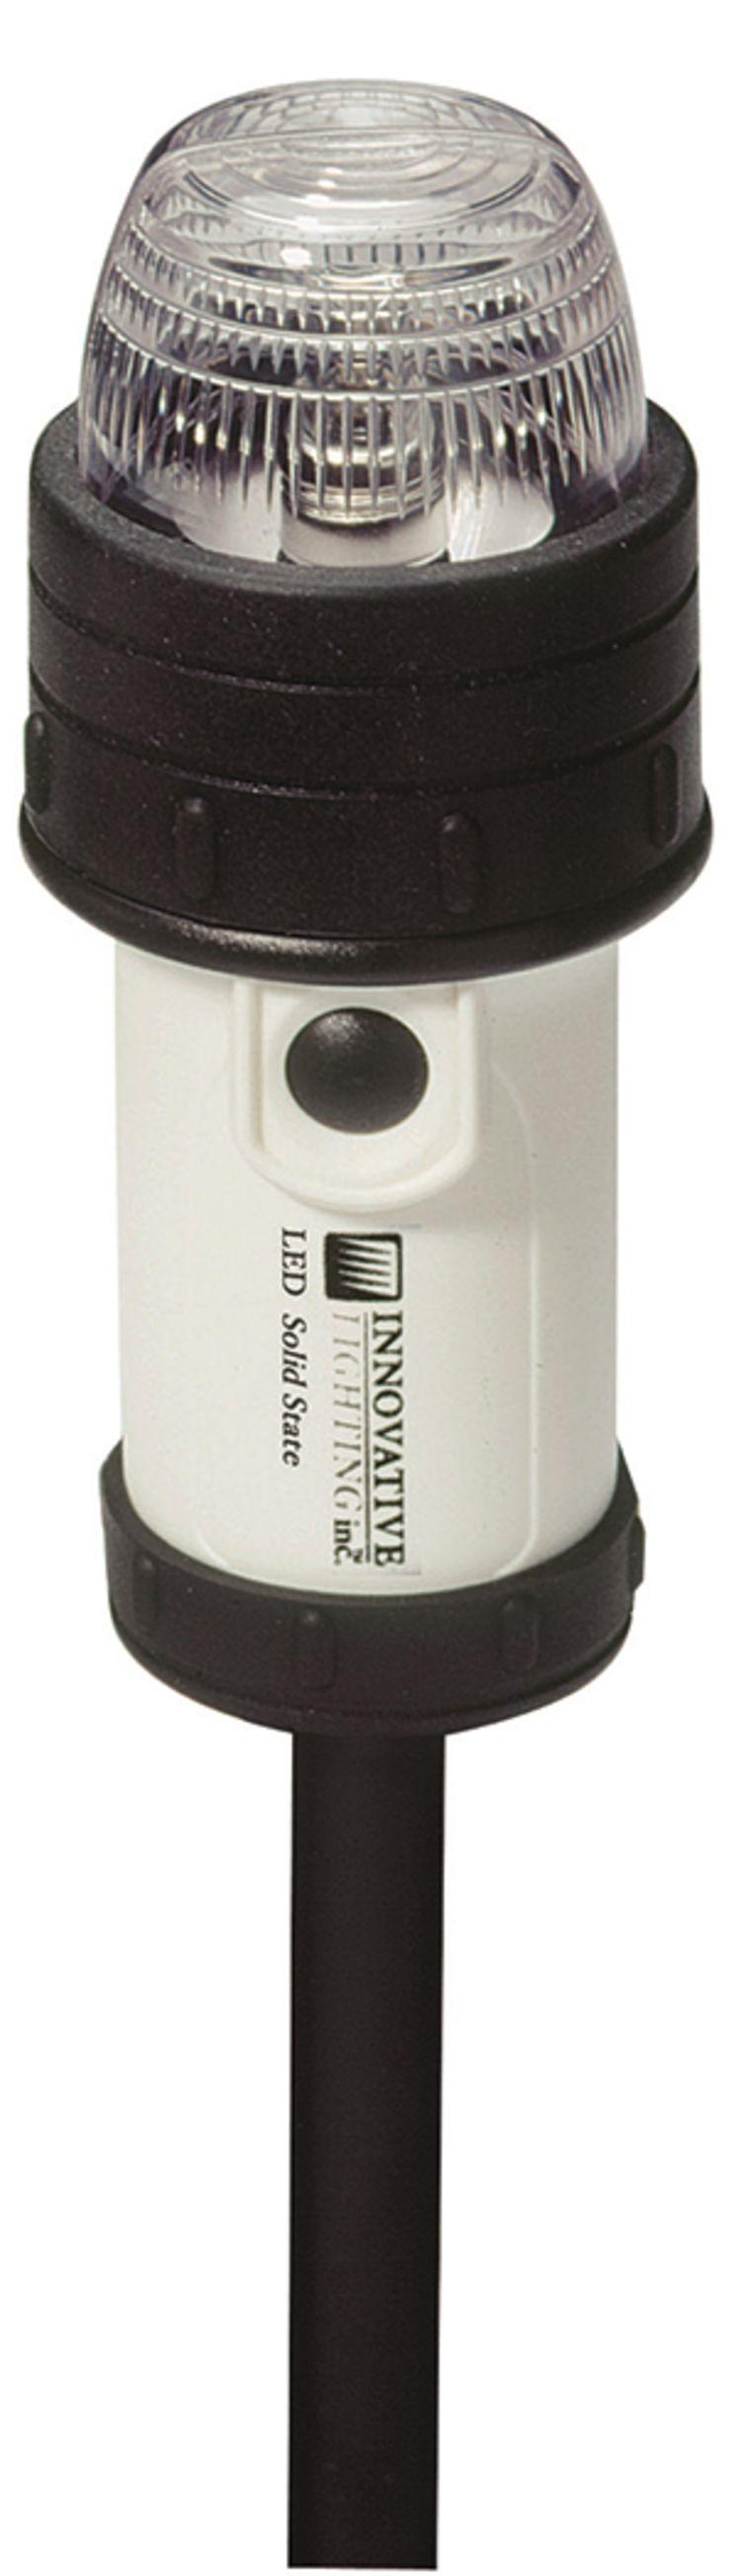 LED Battery Operated Stern Navigation Light - Pole Mount